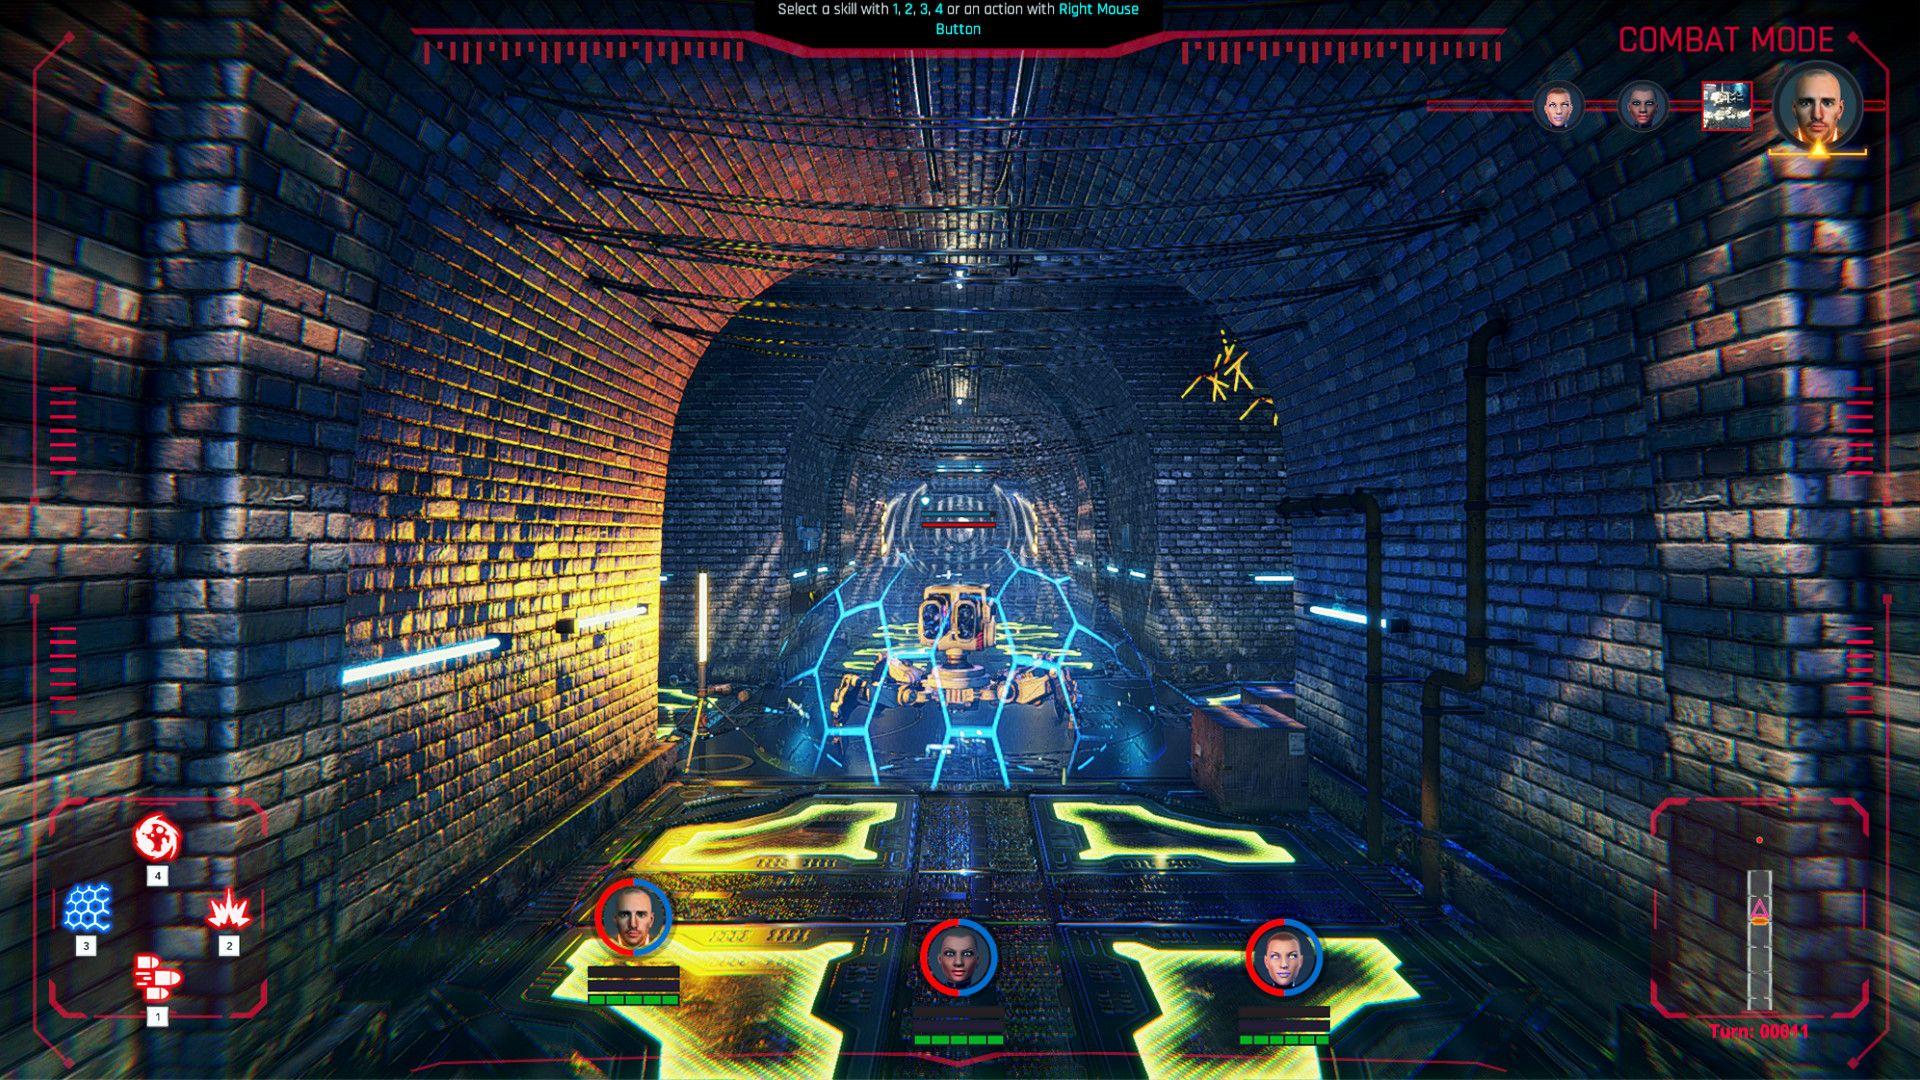 Cyperpunk Dungeon Crawler Conglomerate 451 Delayed to